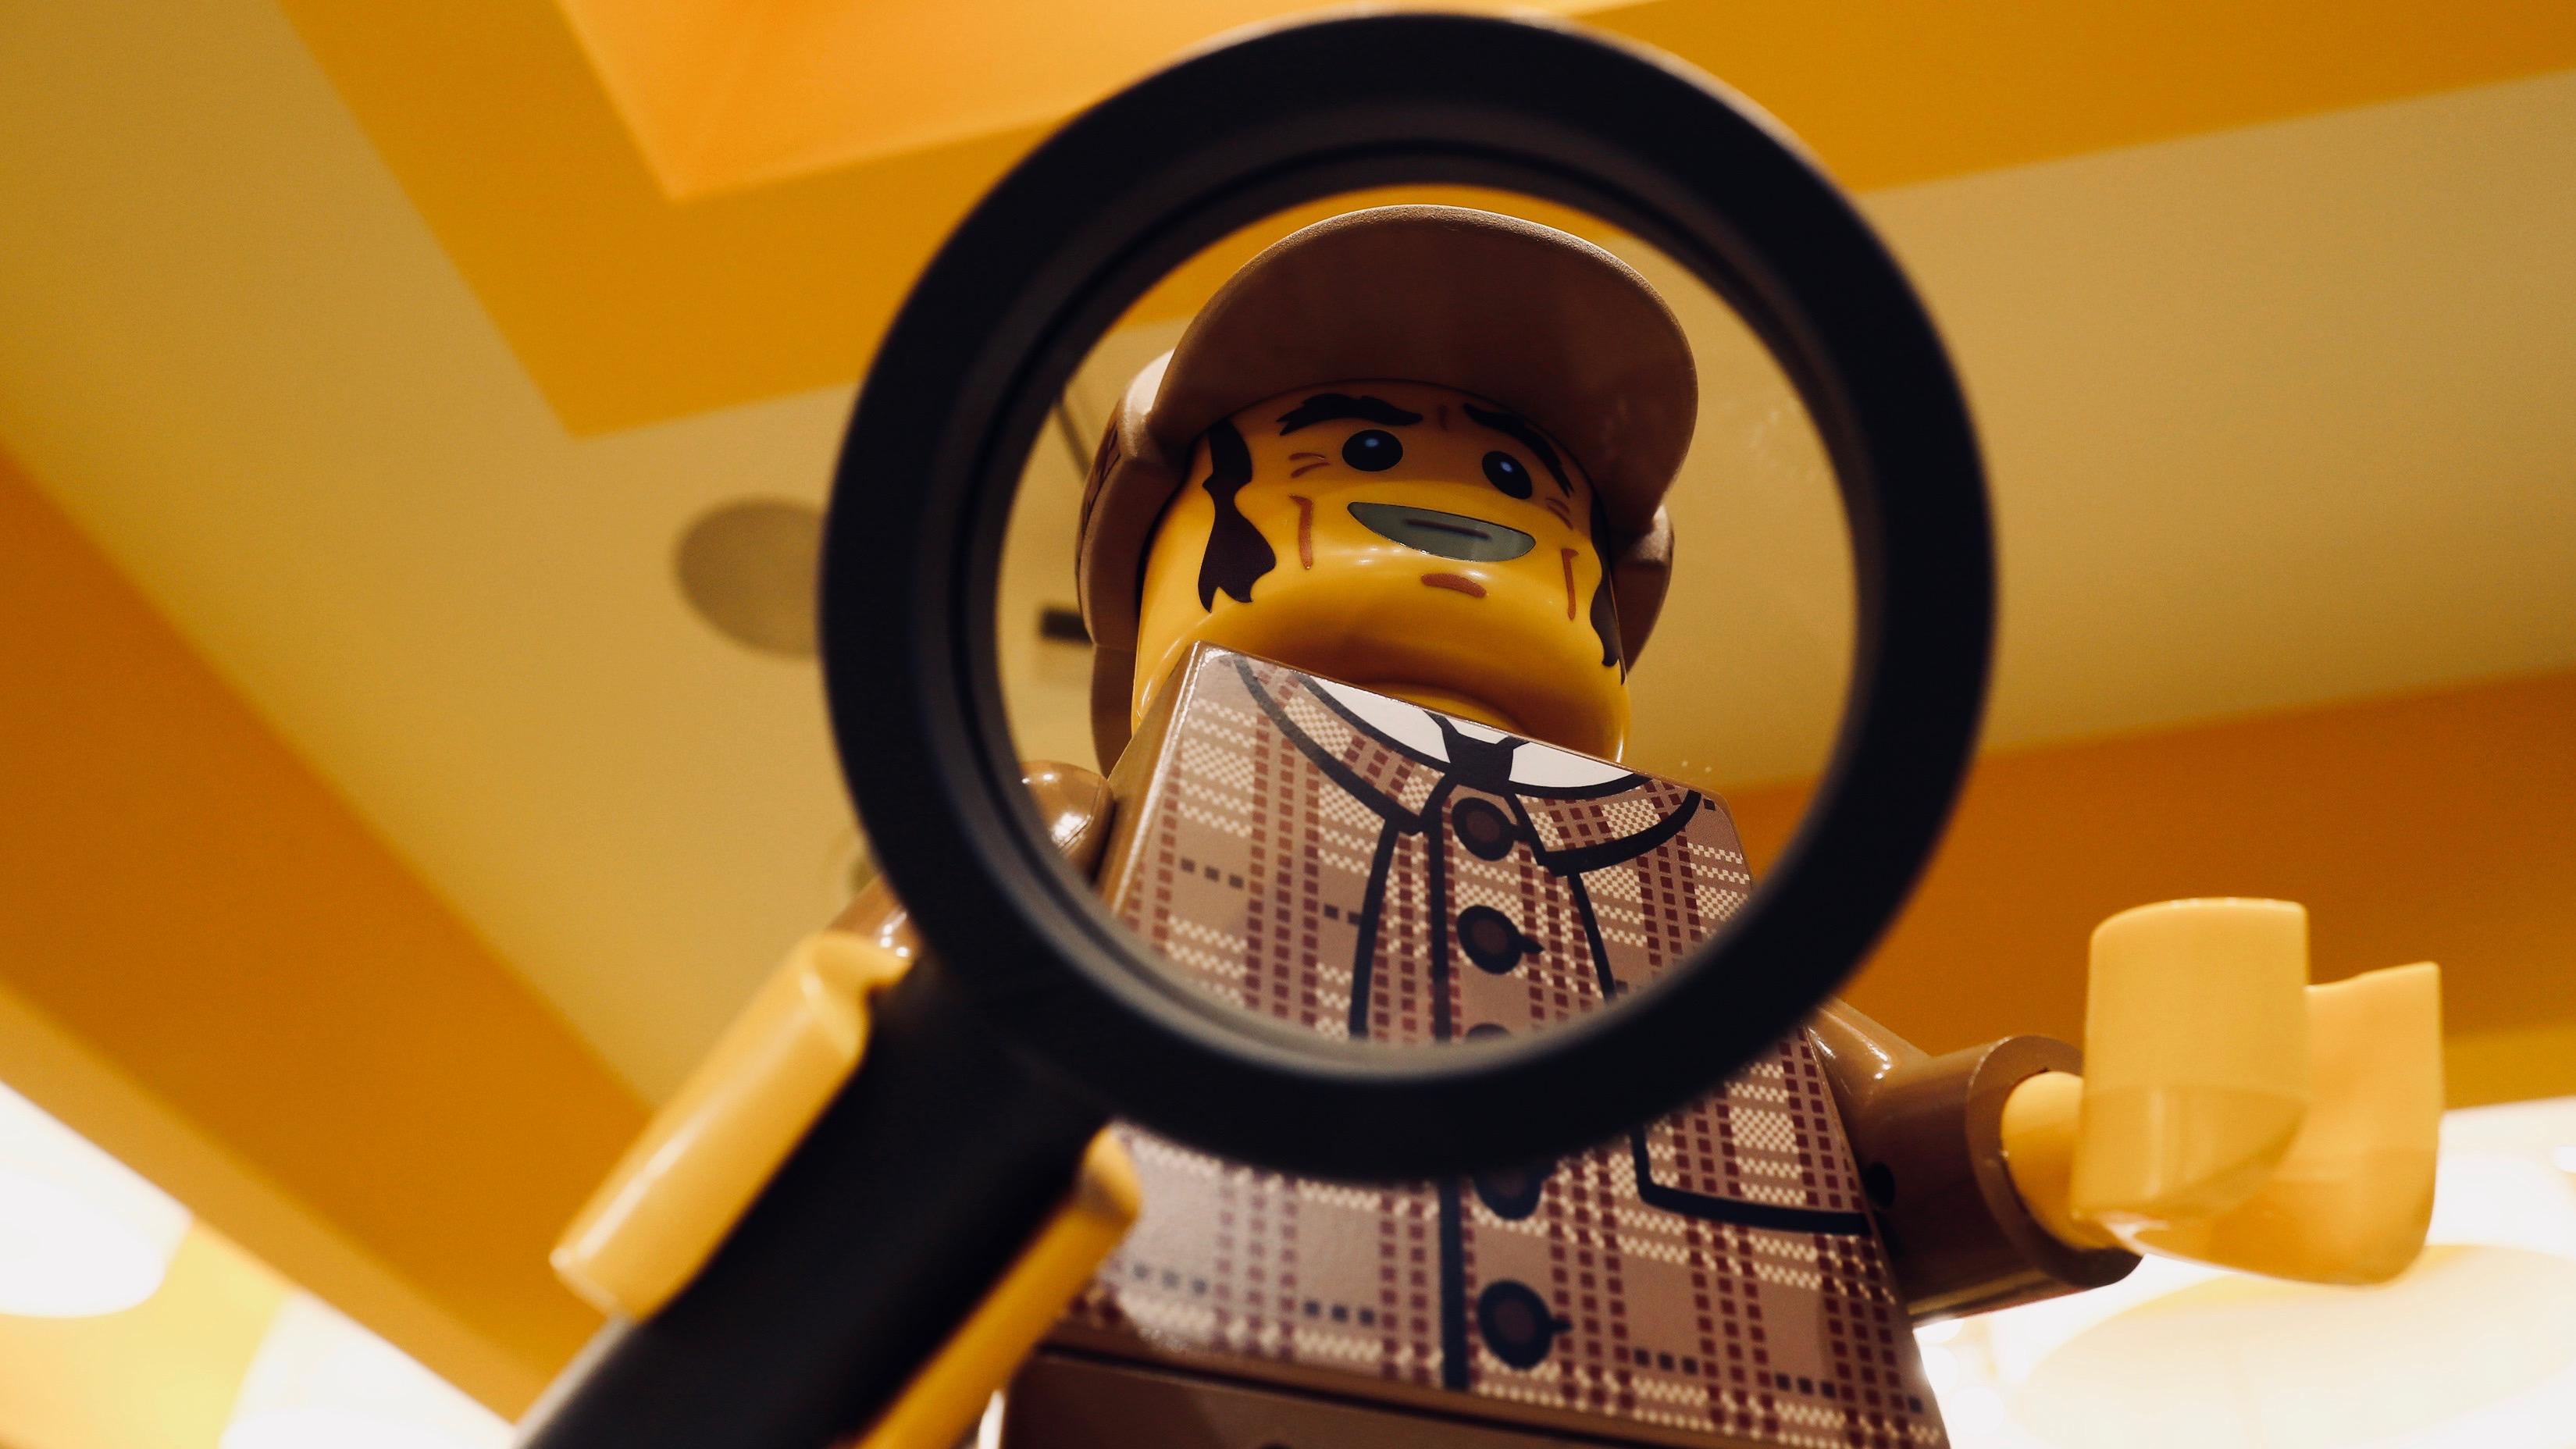 Giant Lego Sherlock Holmes.